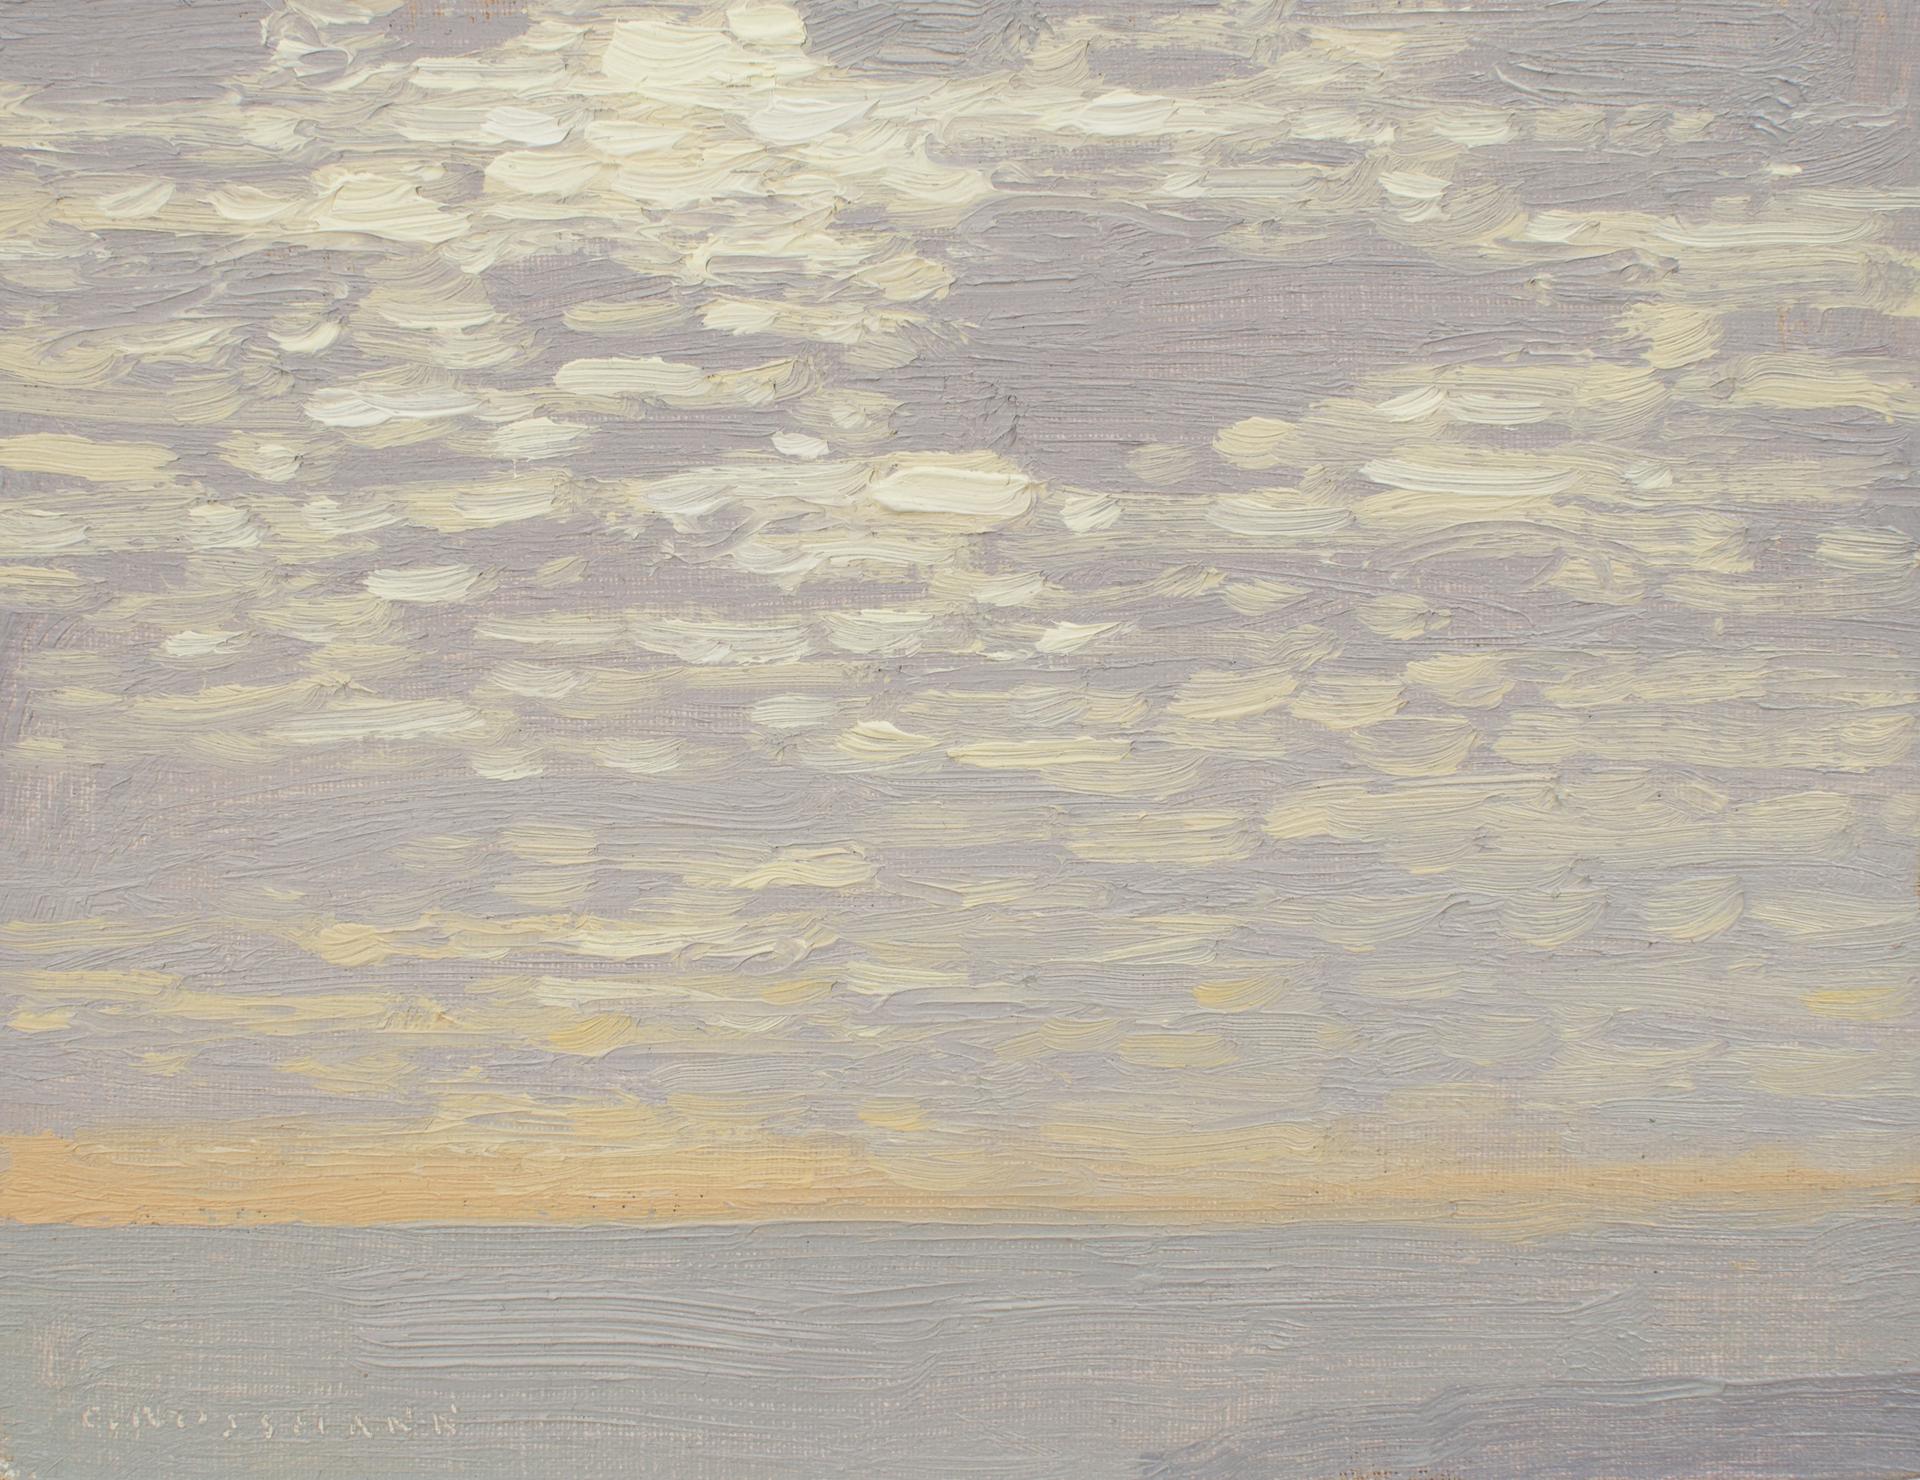 January Morning Clouds by David Grossmann